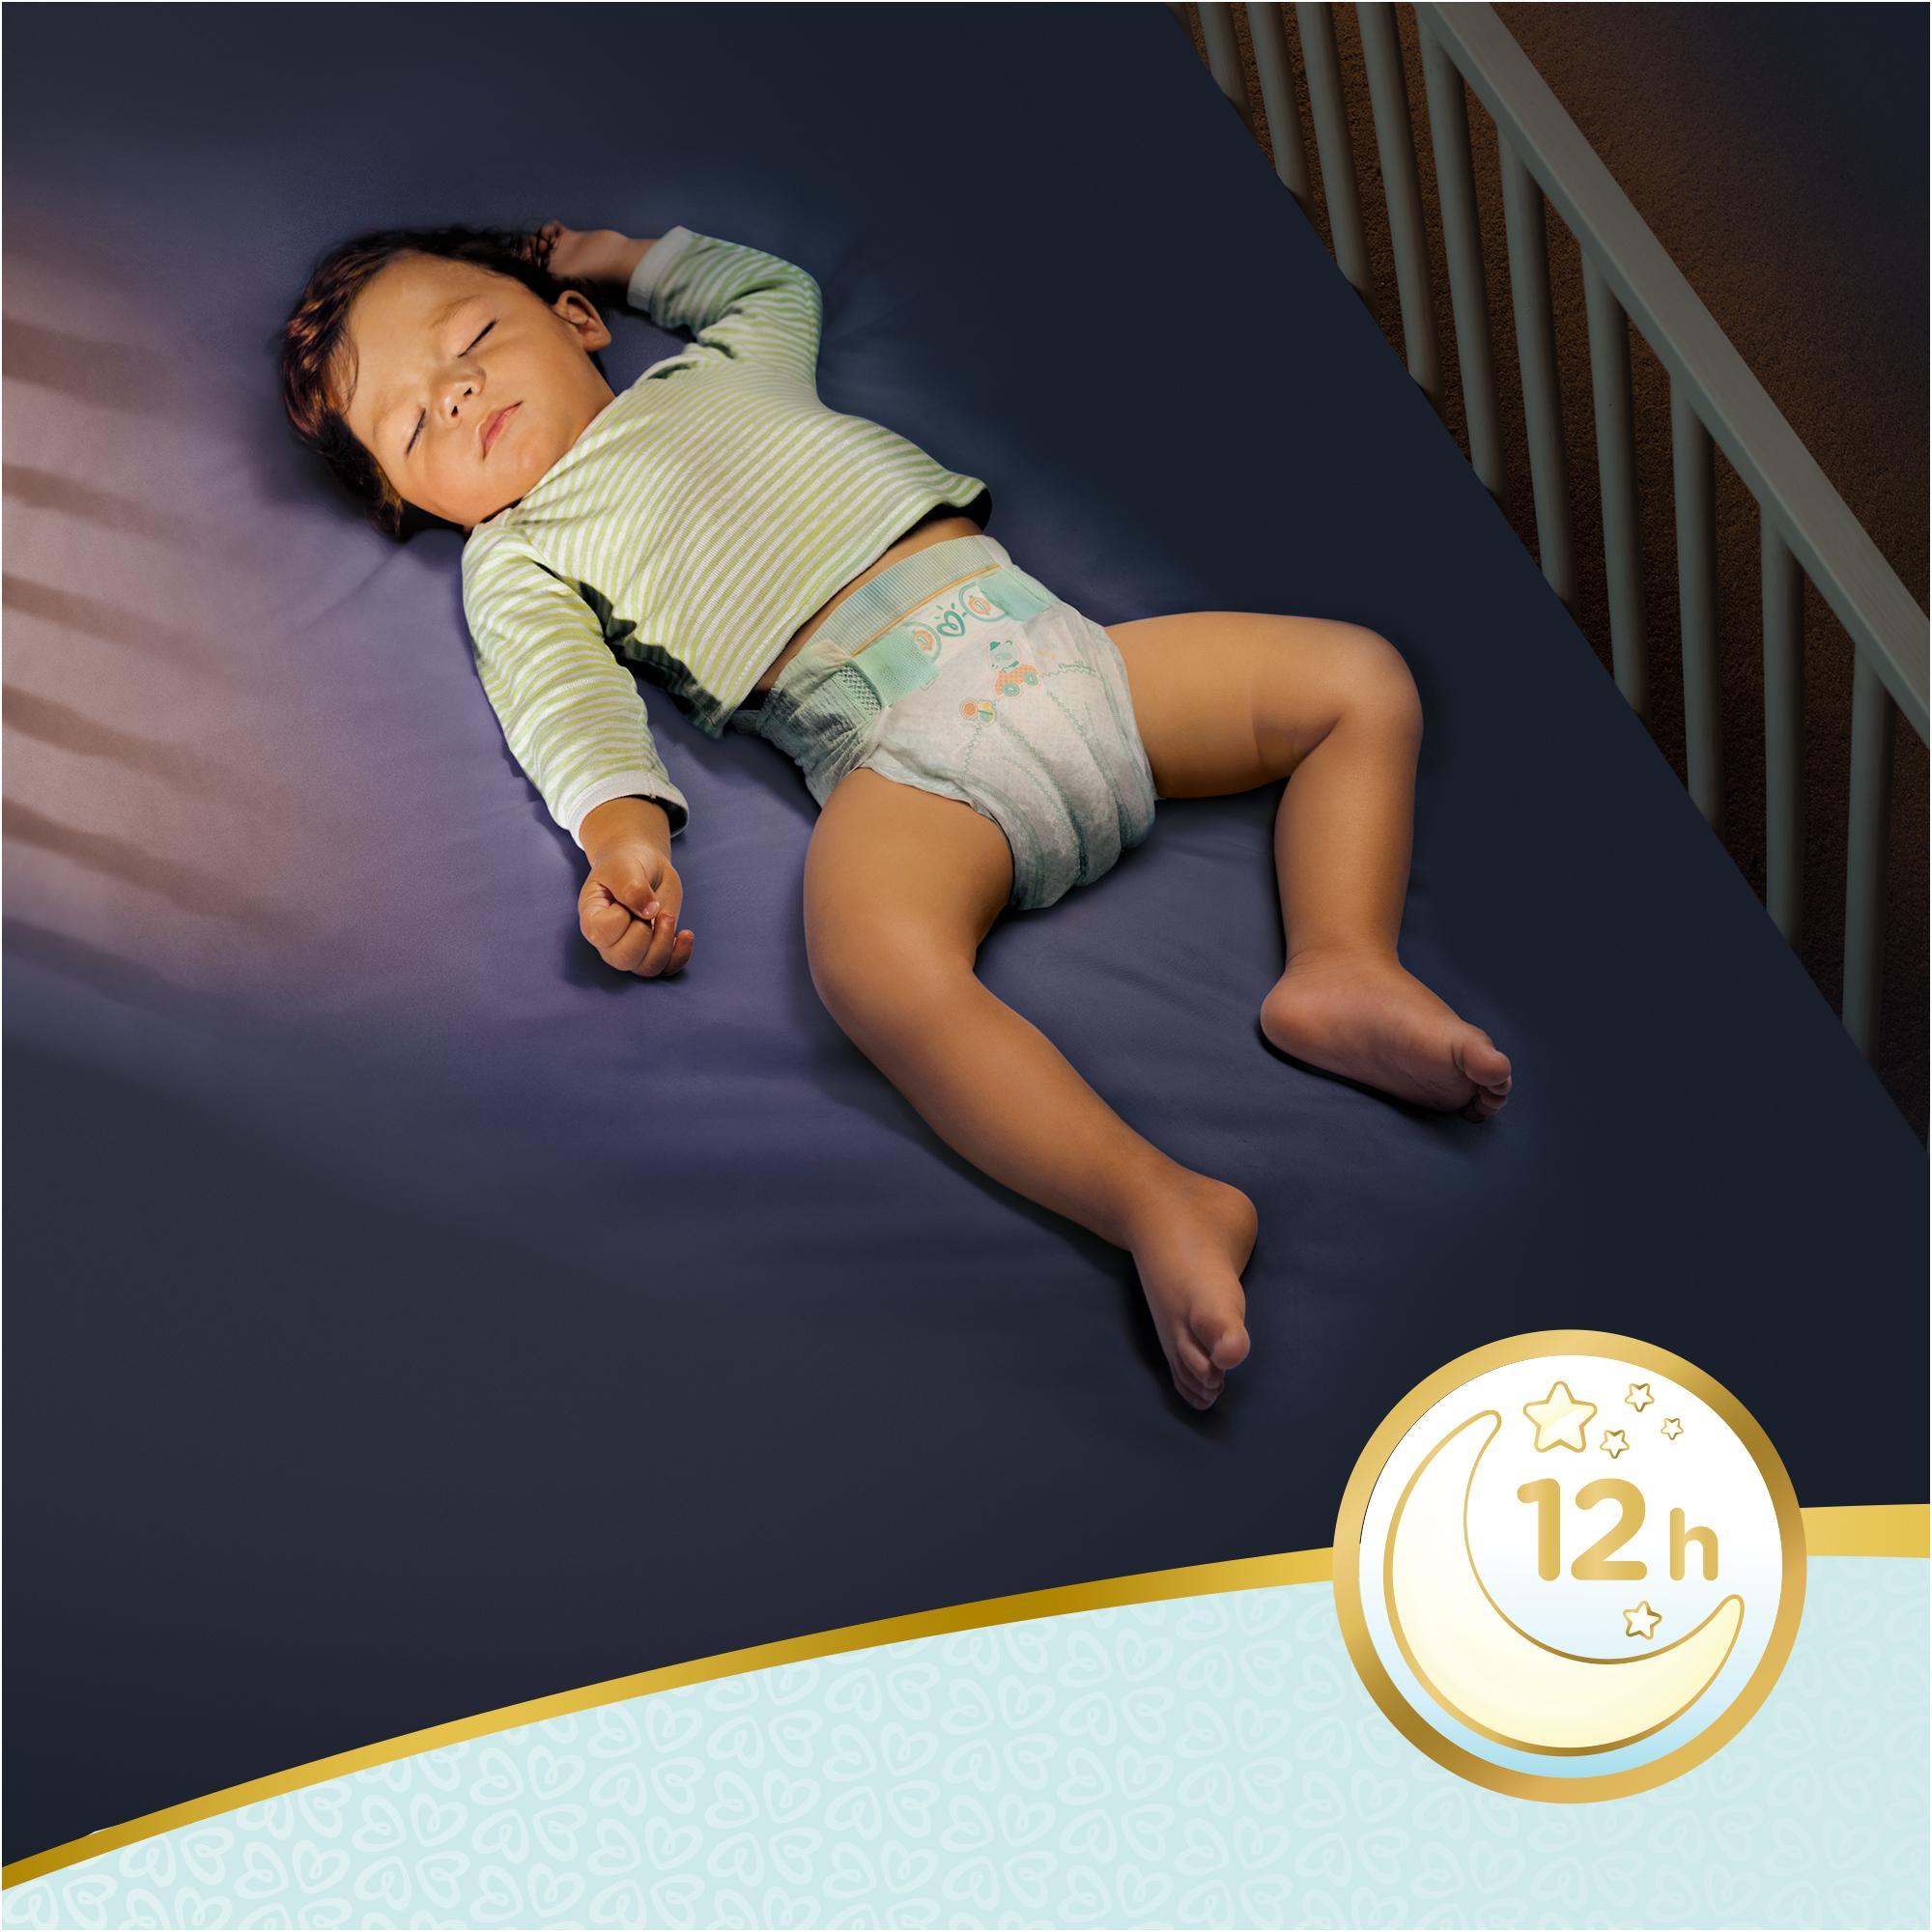 a5e277905d1b Трусики Pampers Premium Care 6-11 кг, размер 3 (Midi), 28 трусиков ...